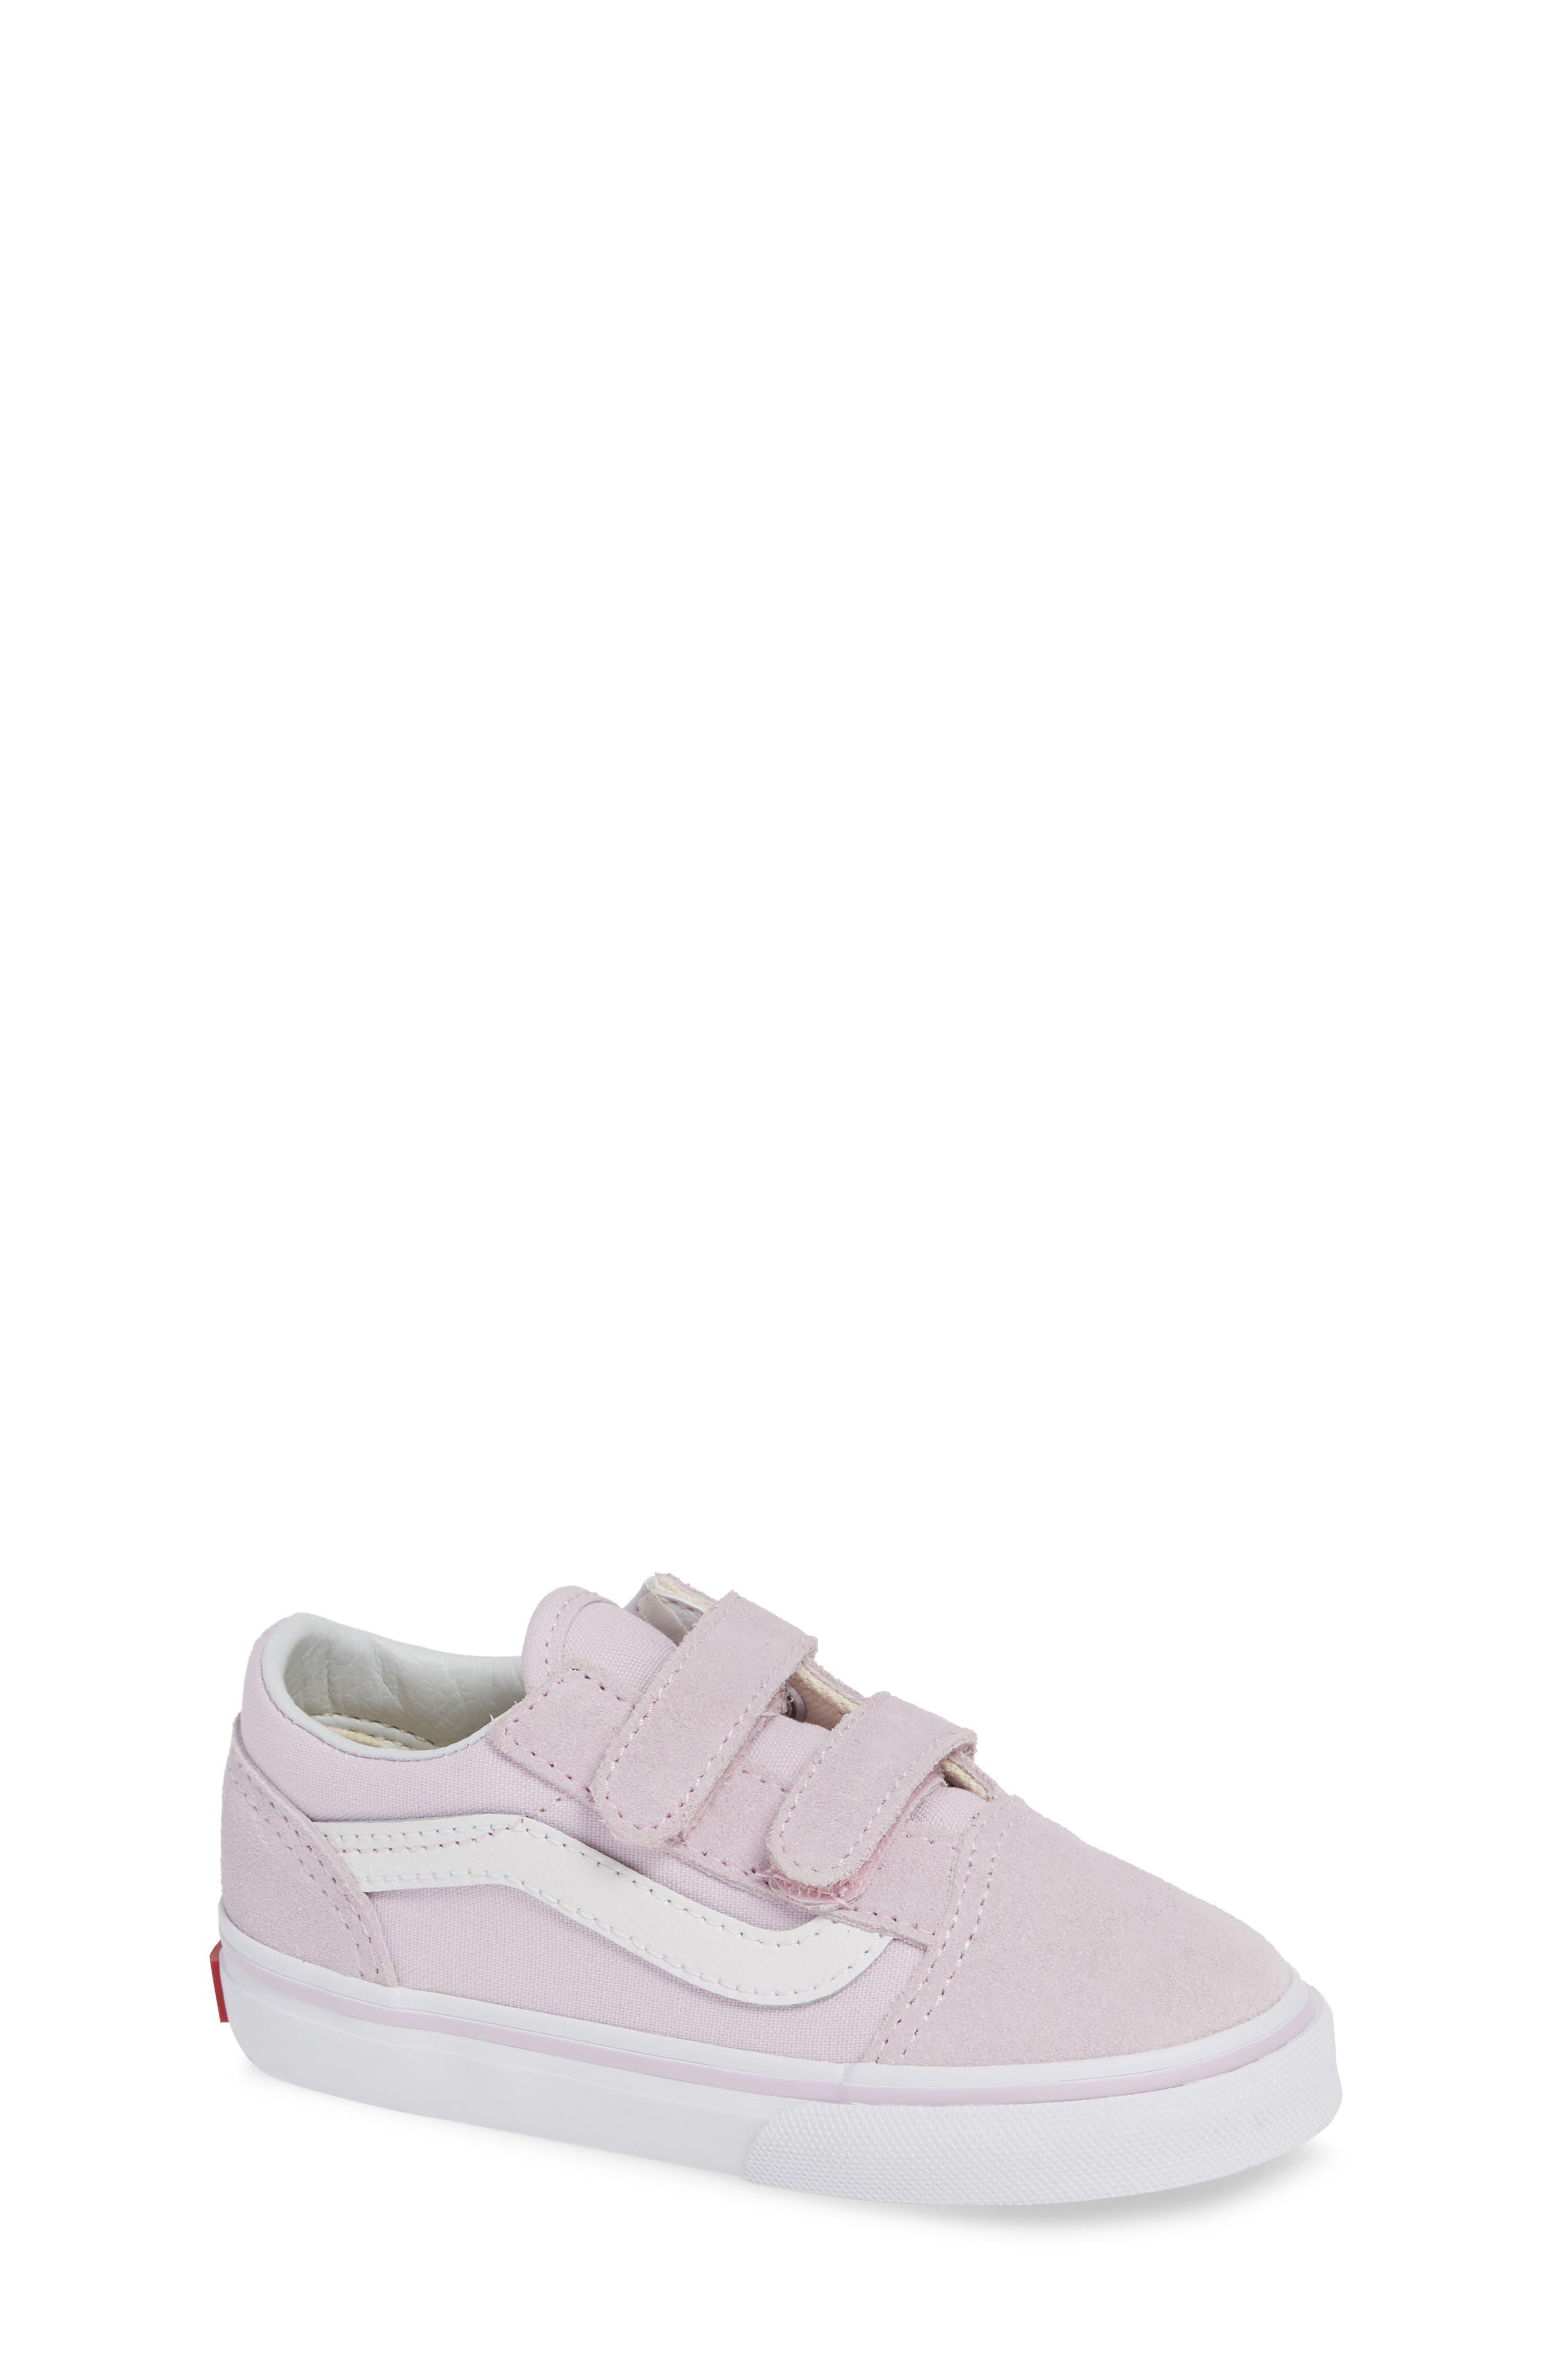 'Old Skool V' Sneaker,                         Main,                         color, LAVENDER FOG/ TRUE WHITE